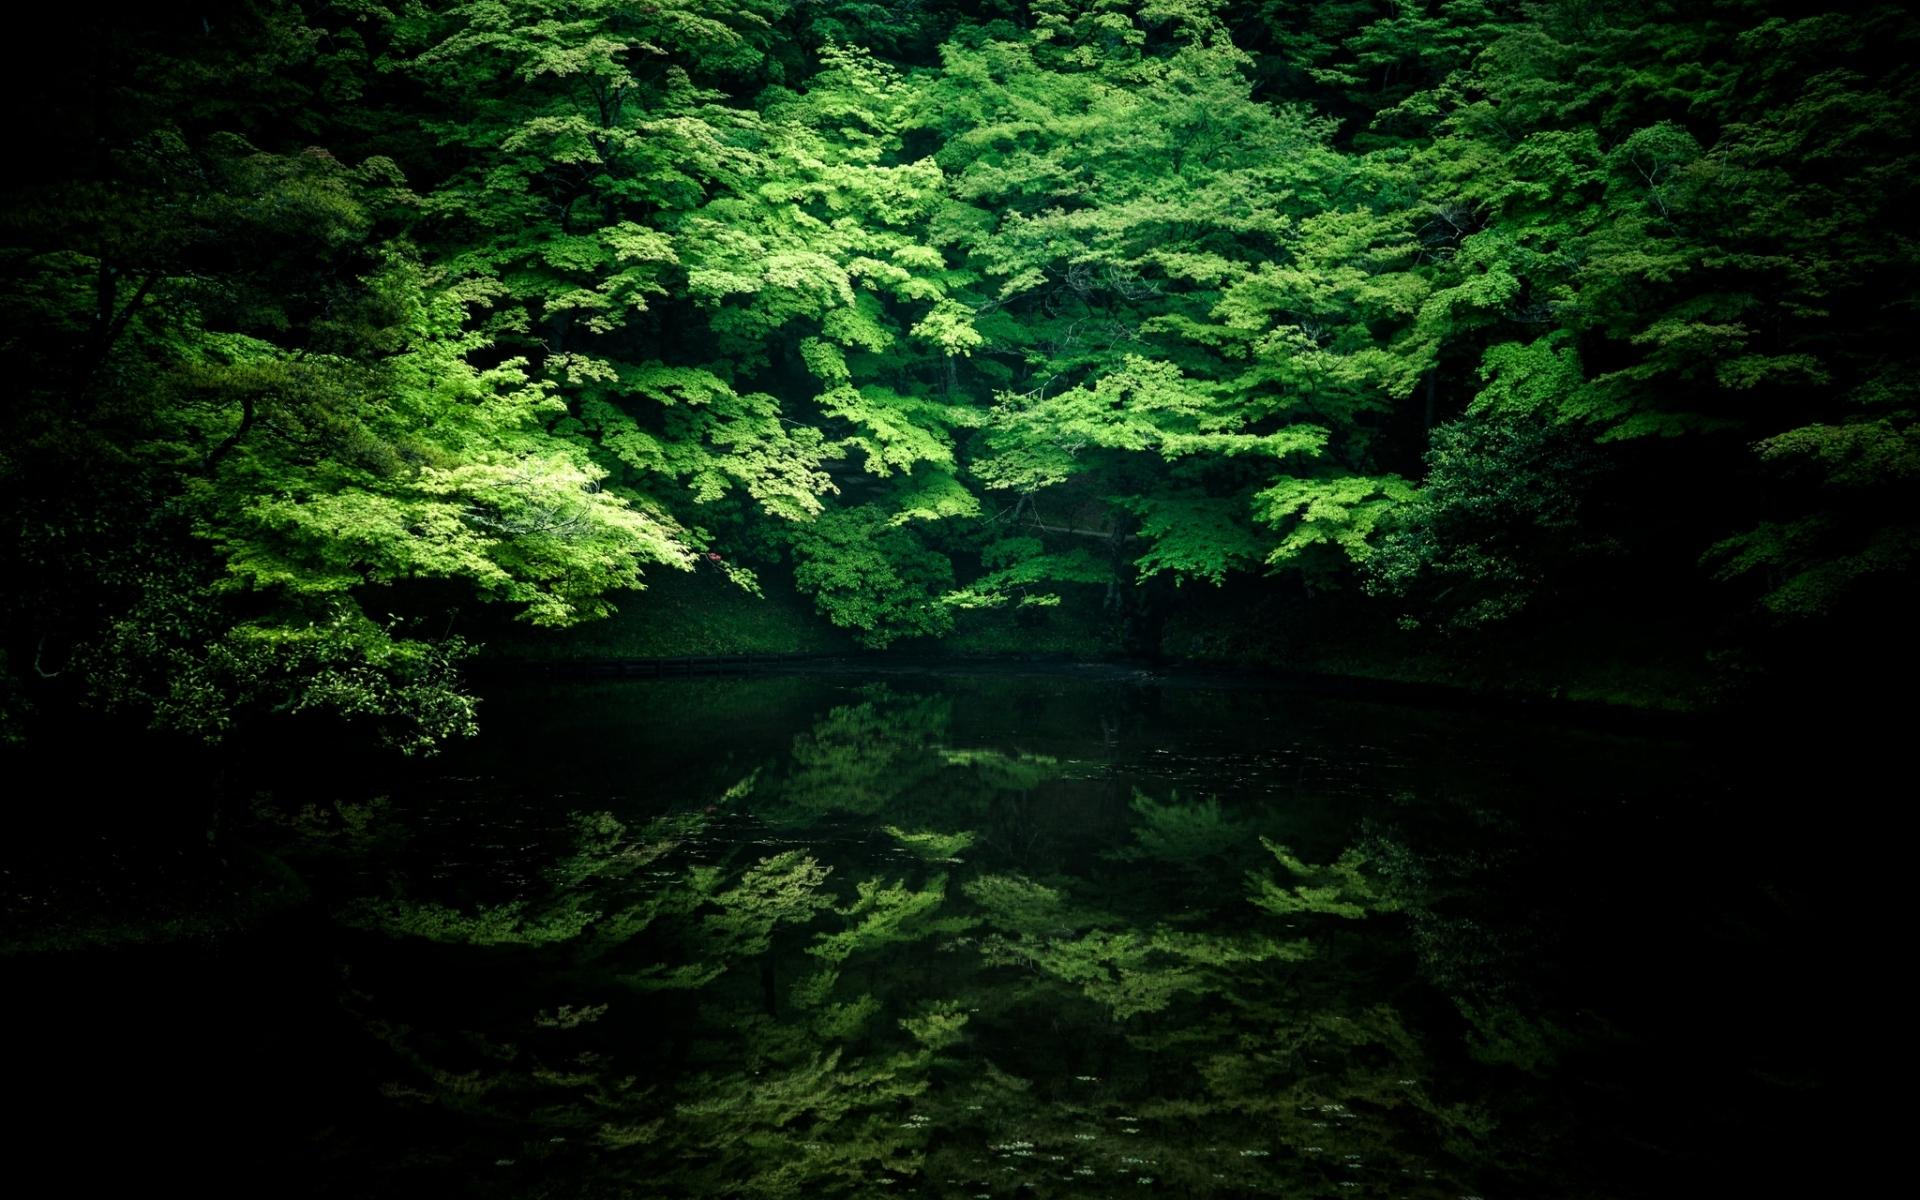 Картинки Деревья, река, тень фото и обои на рабочий стол